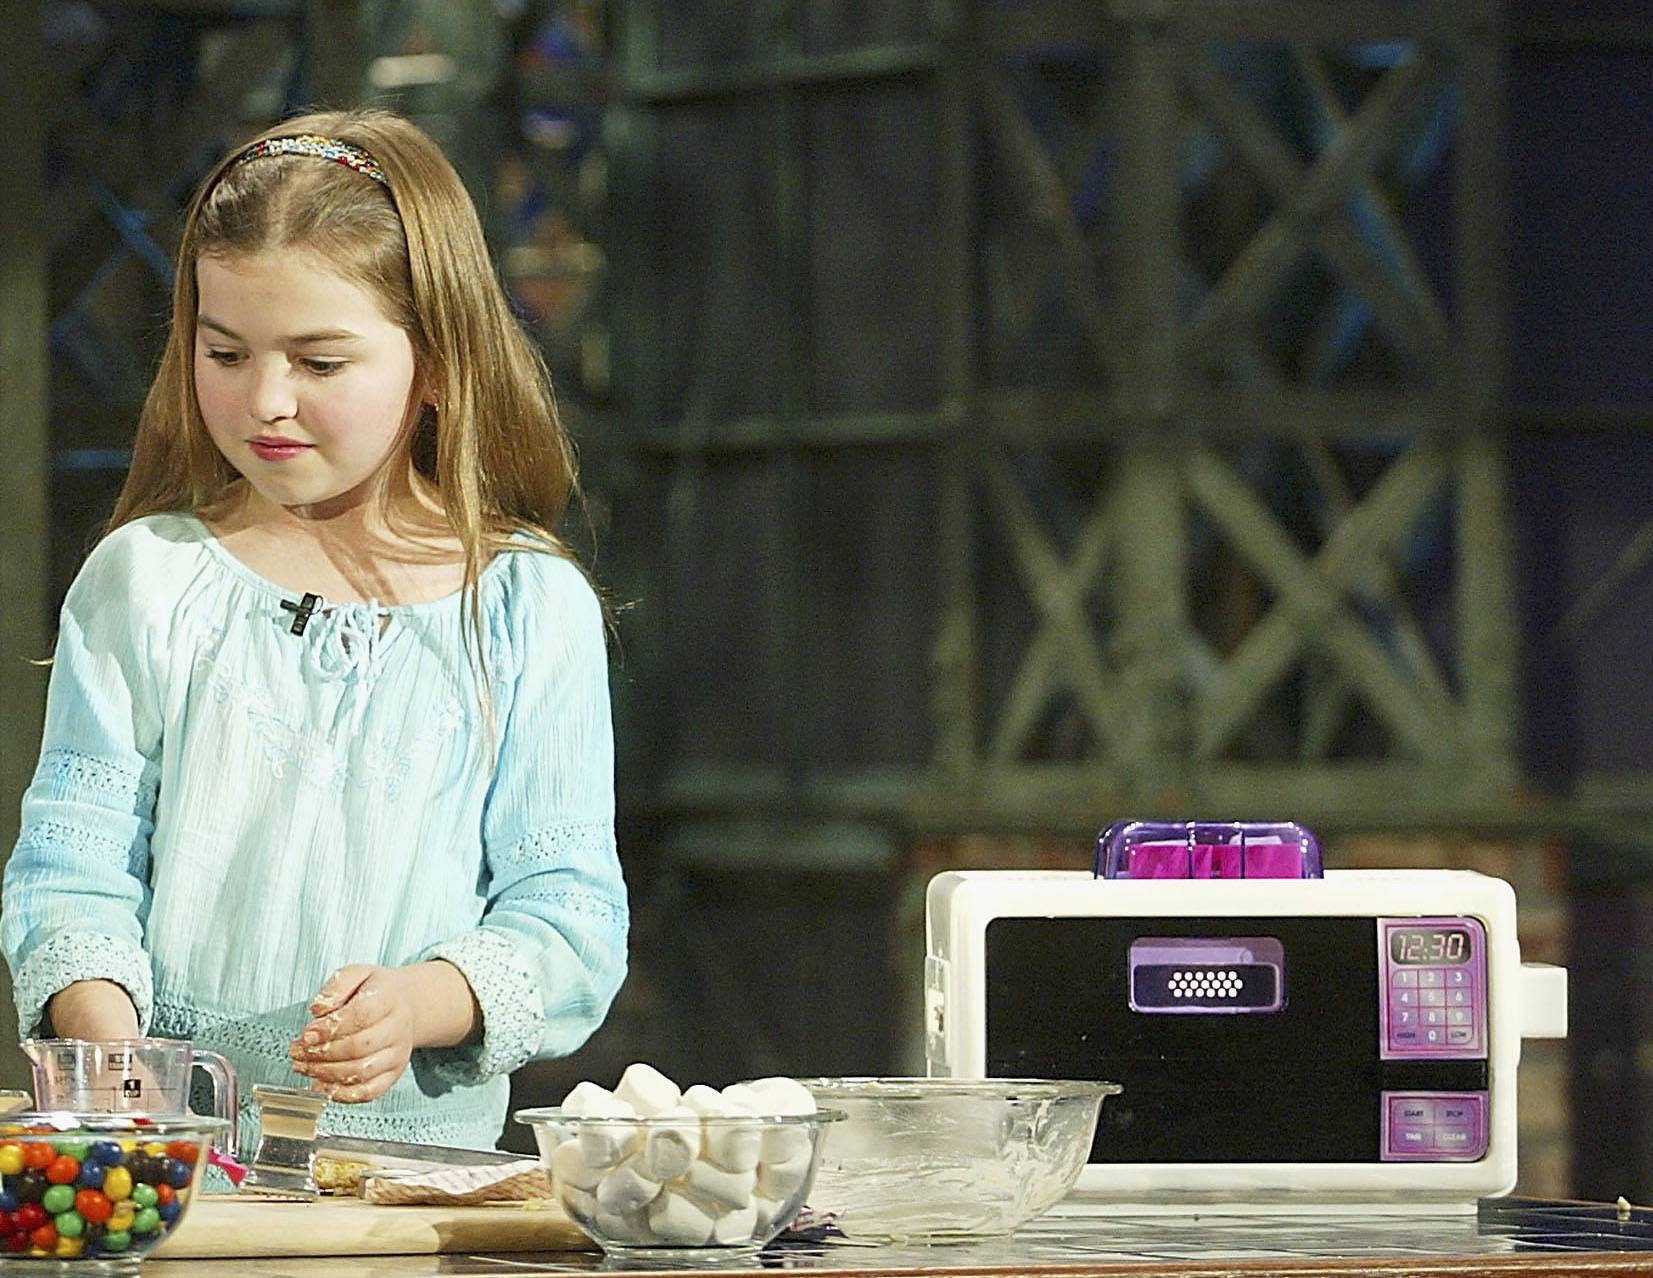 Girl with easy bake oven